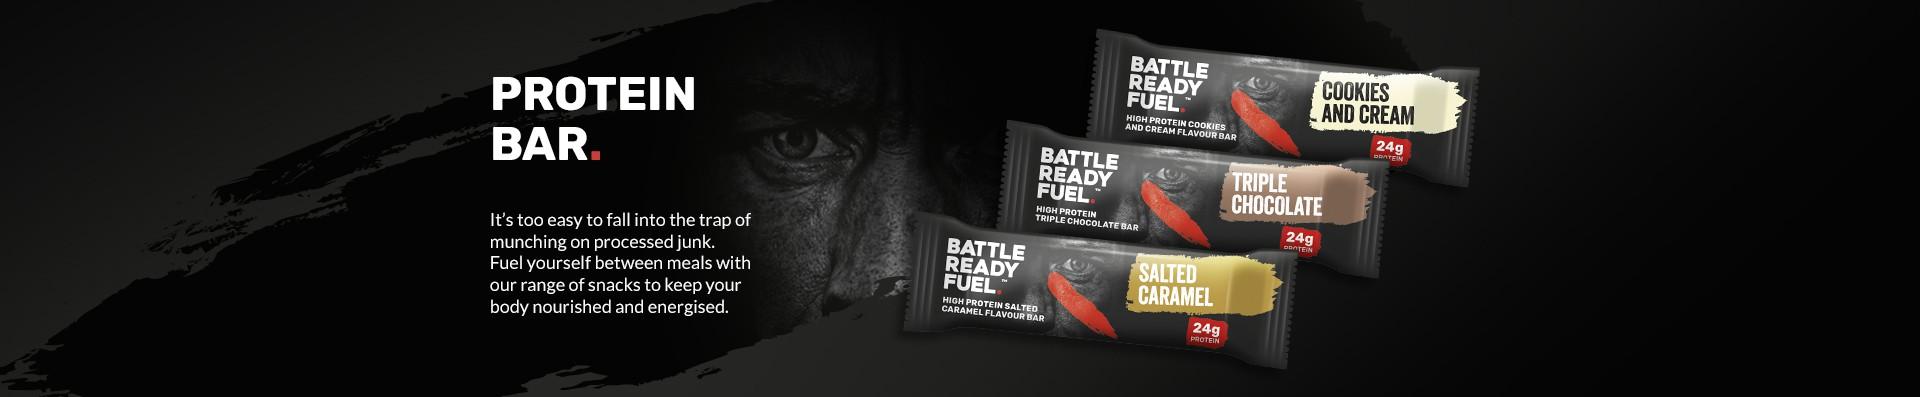 Header Images for Supplement Brand